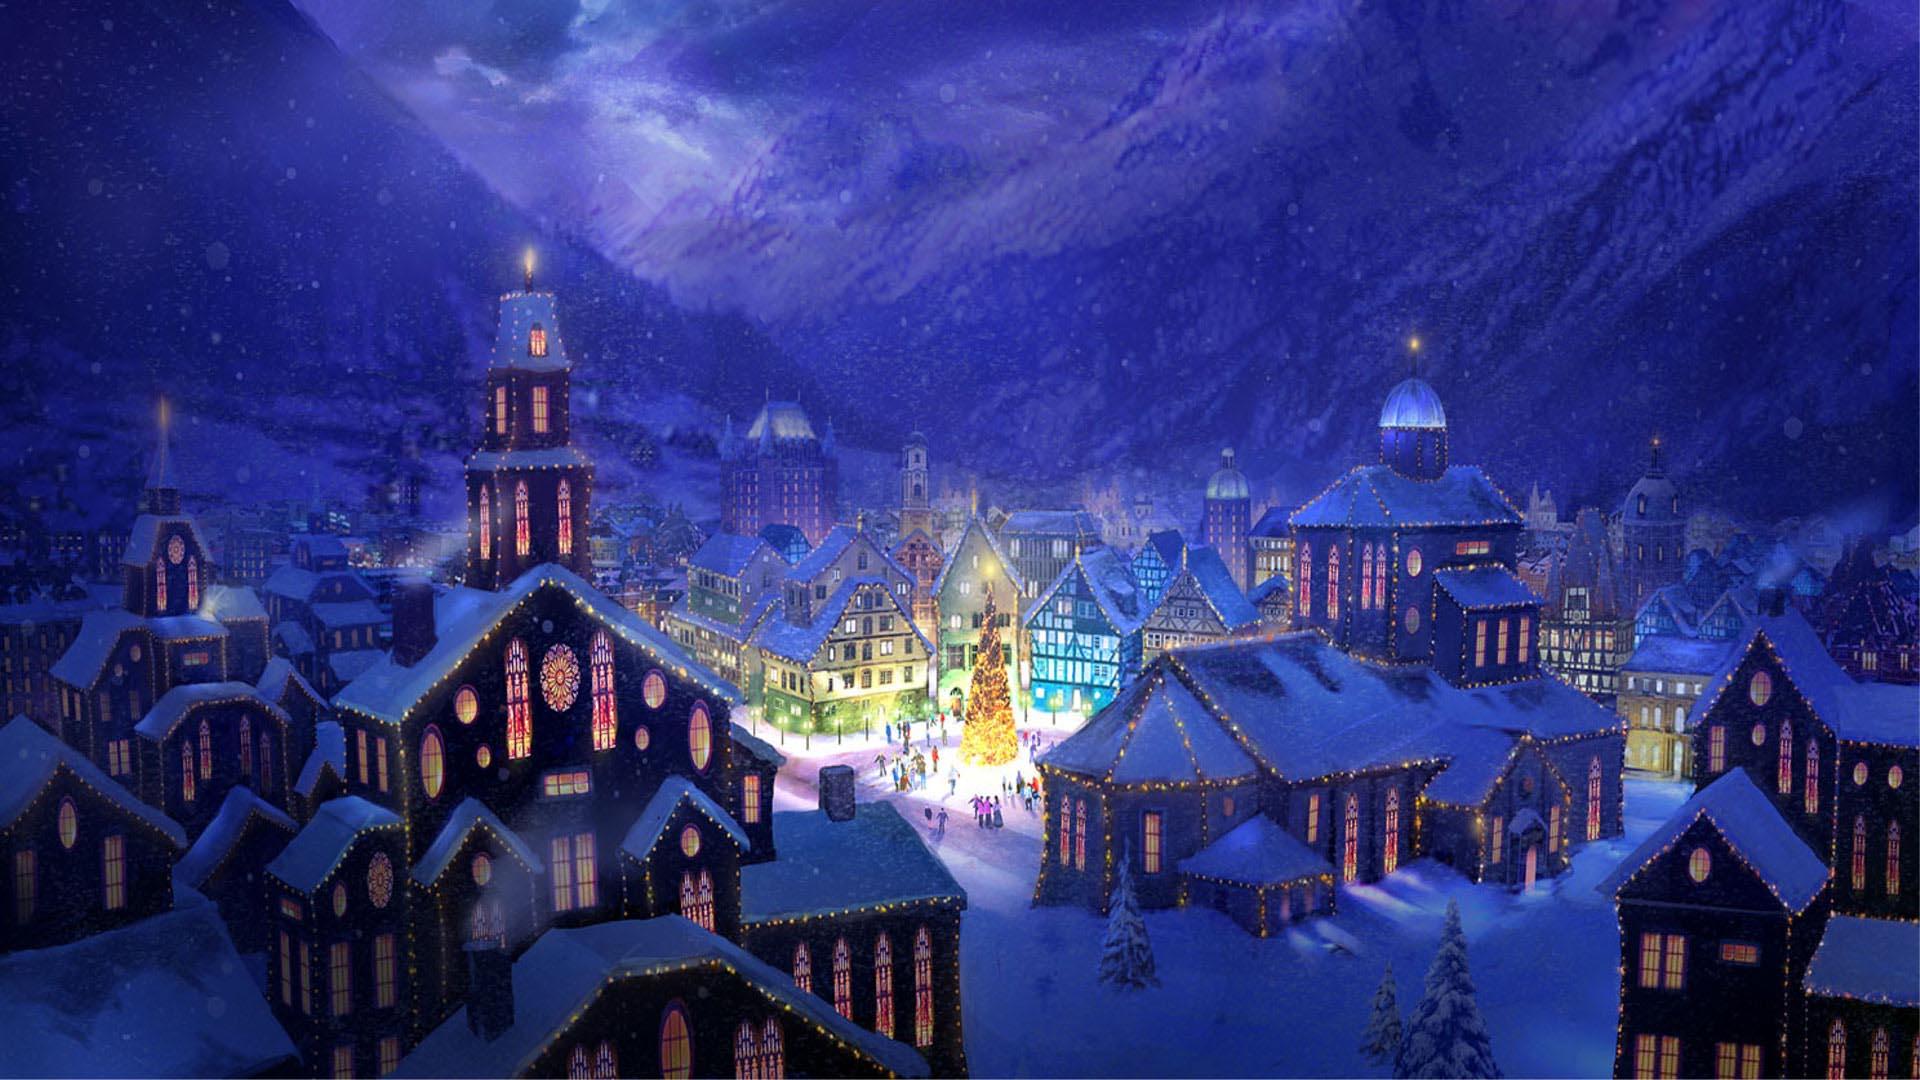 Christmas Wallpaper Hd 174724 1920x1080